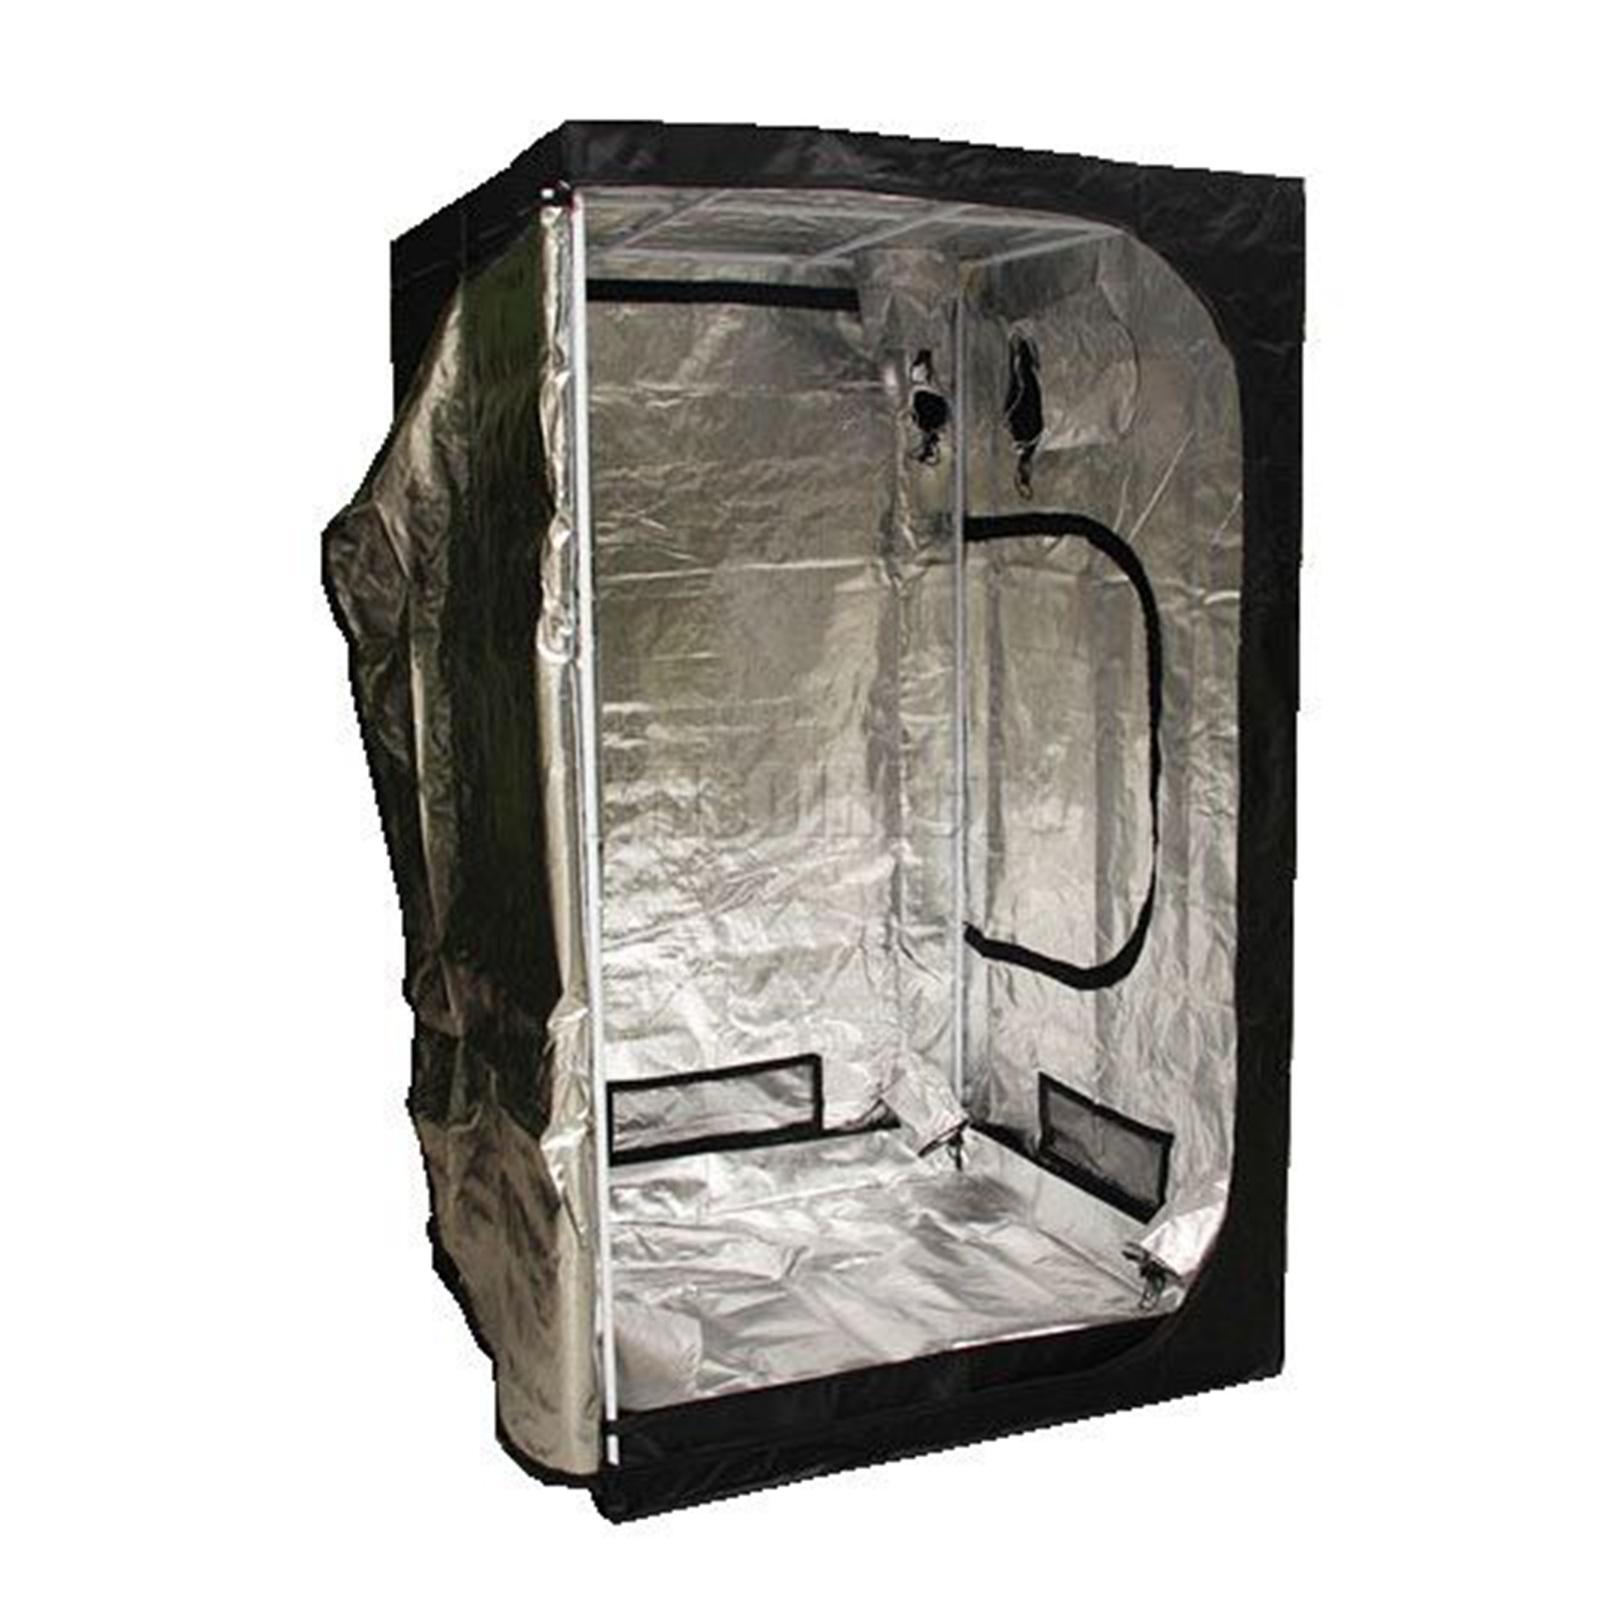 Indoor-Portable-Grow-Tent-Box-Silver-Mylar-Hydroponics-Bud-Green-Room-New-Design miniatuur 15